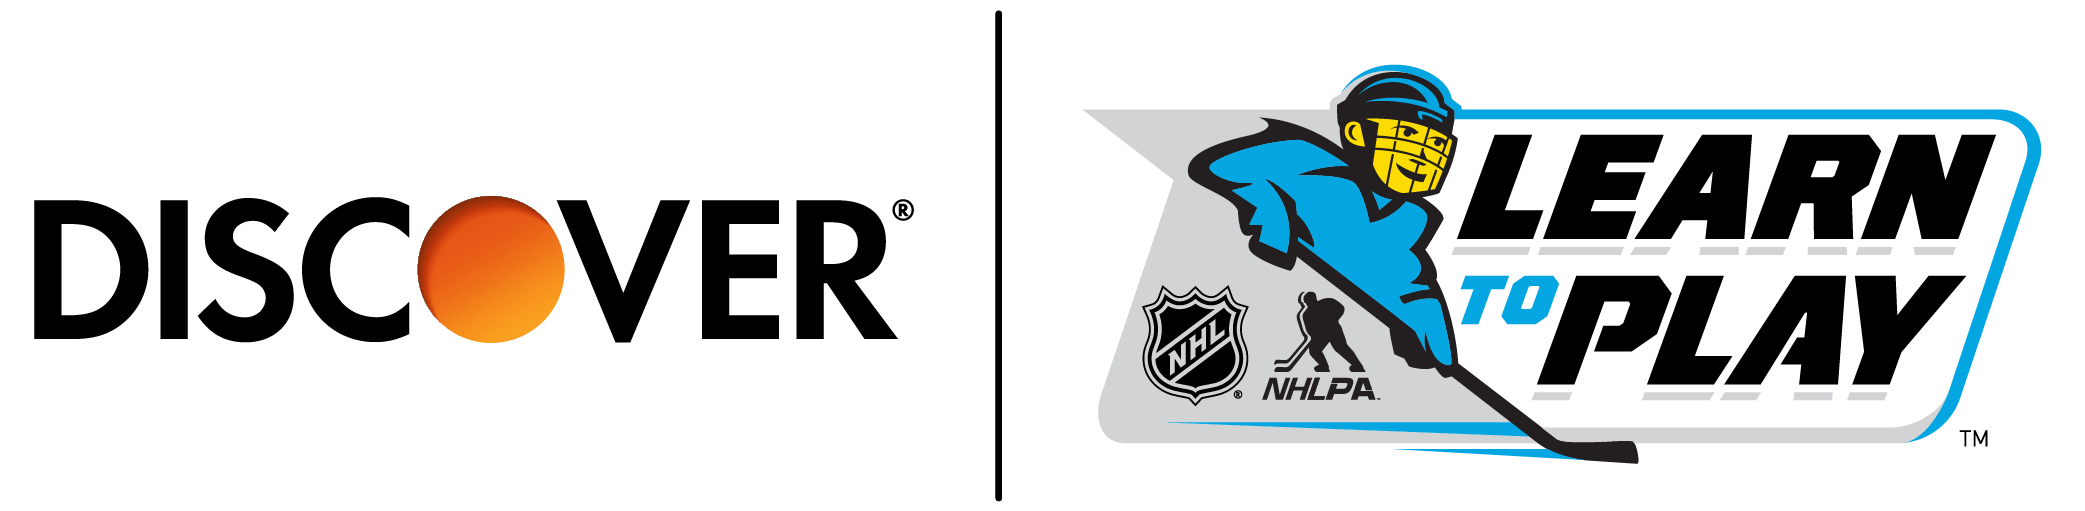 NHL LTP DISCOVER LOGO